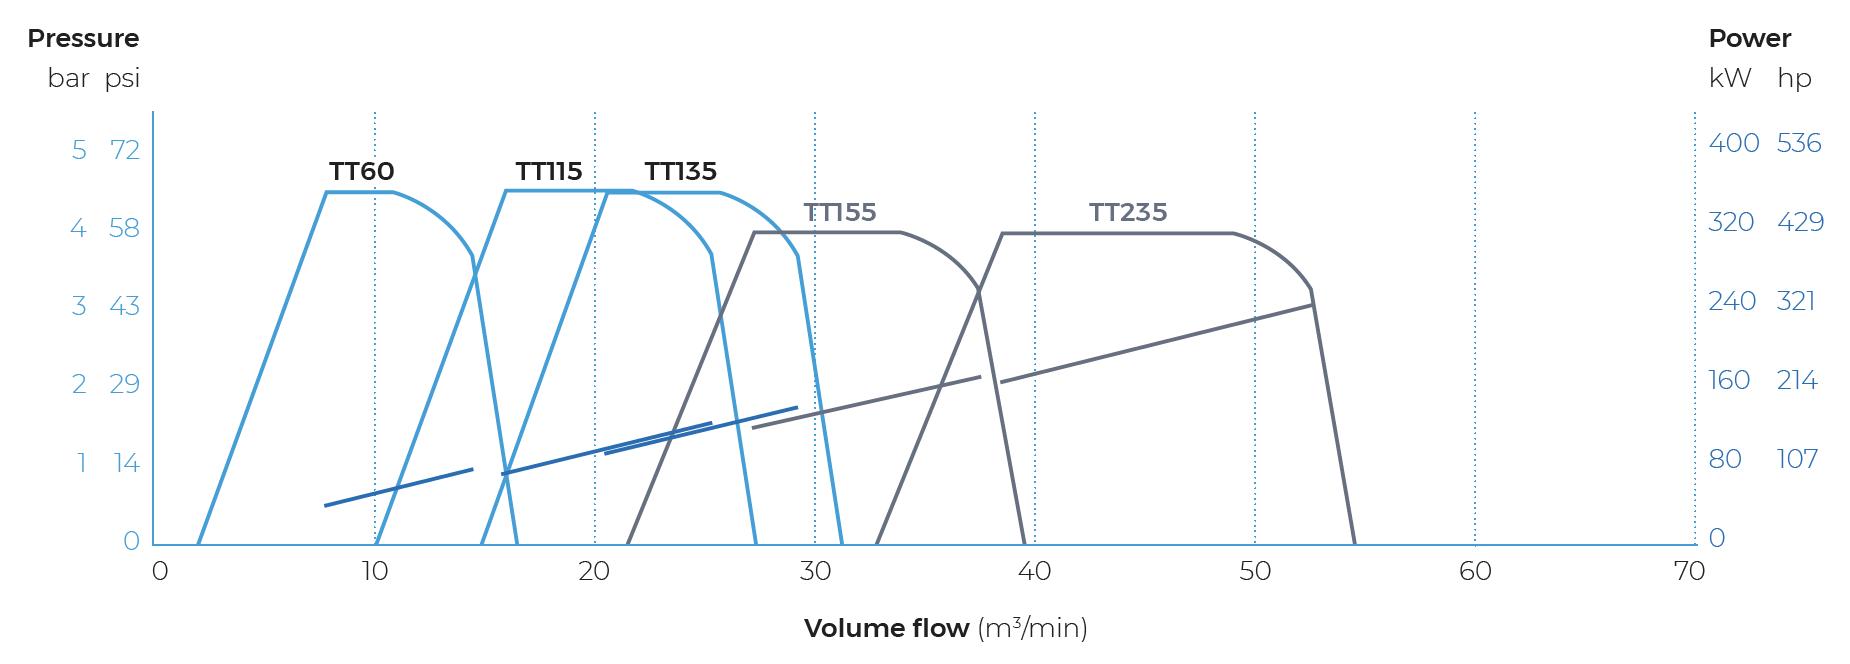 Low Pressure Product Range